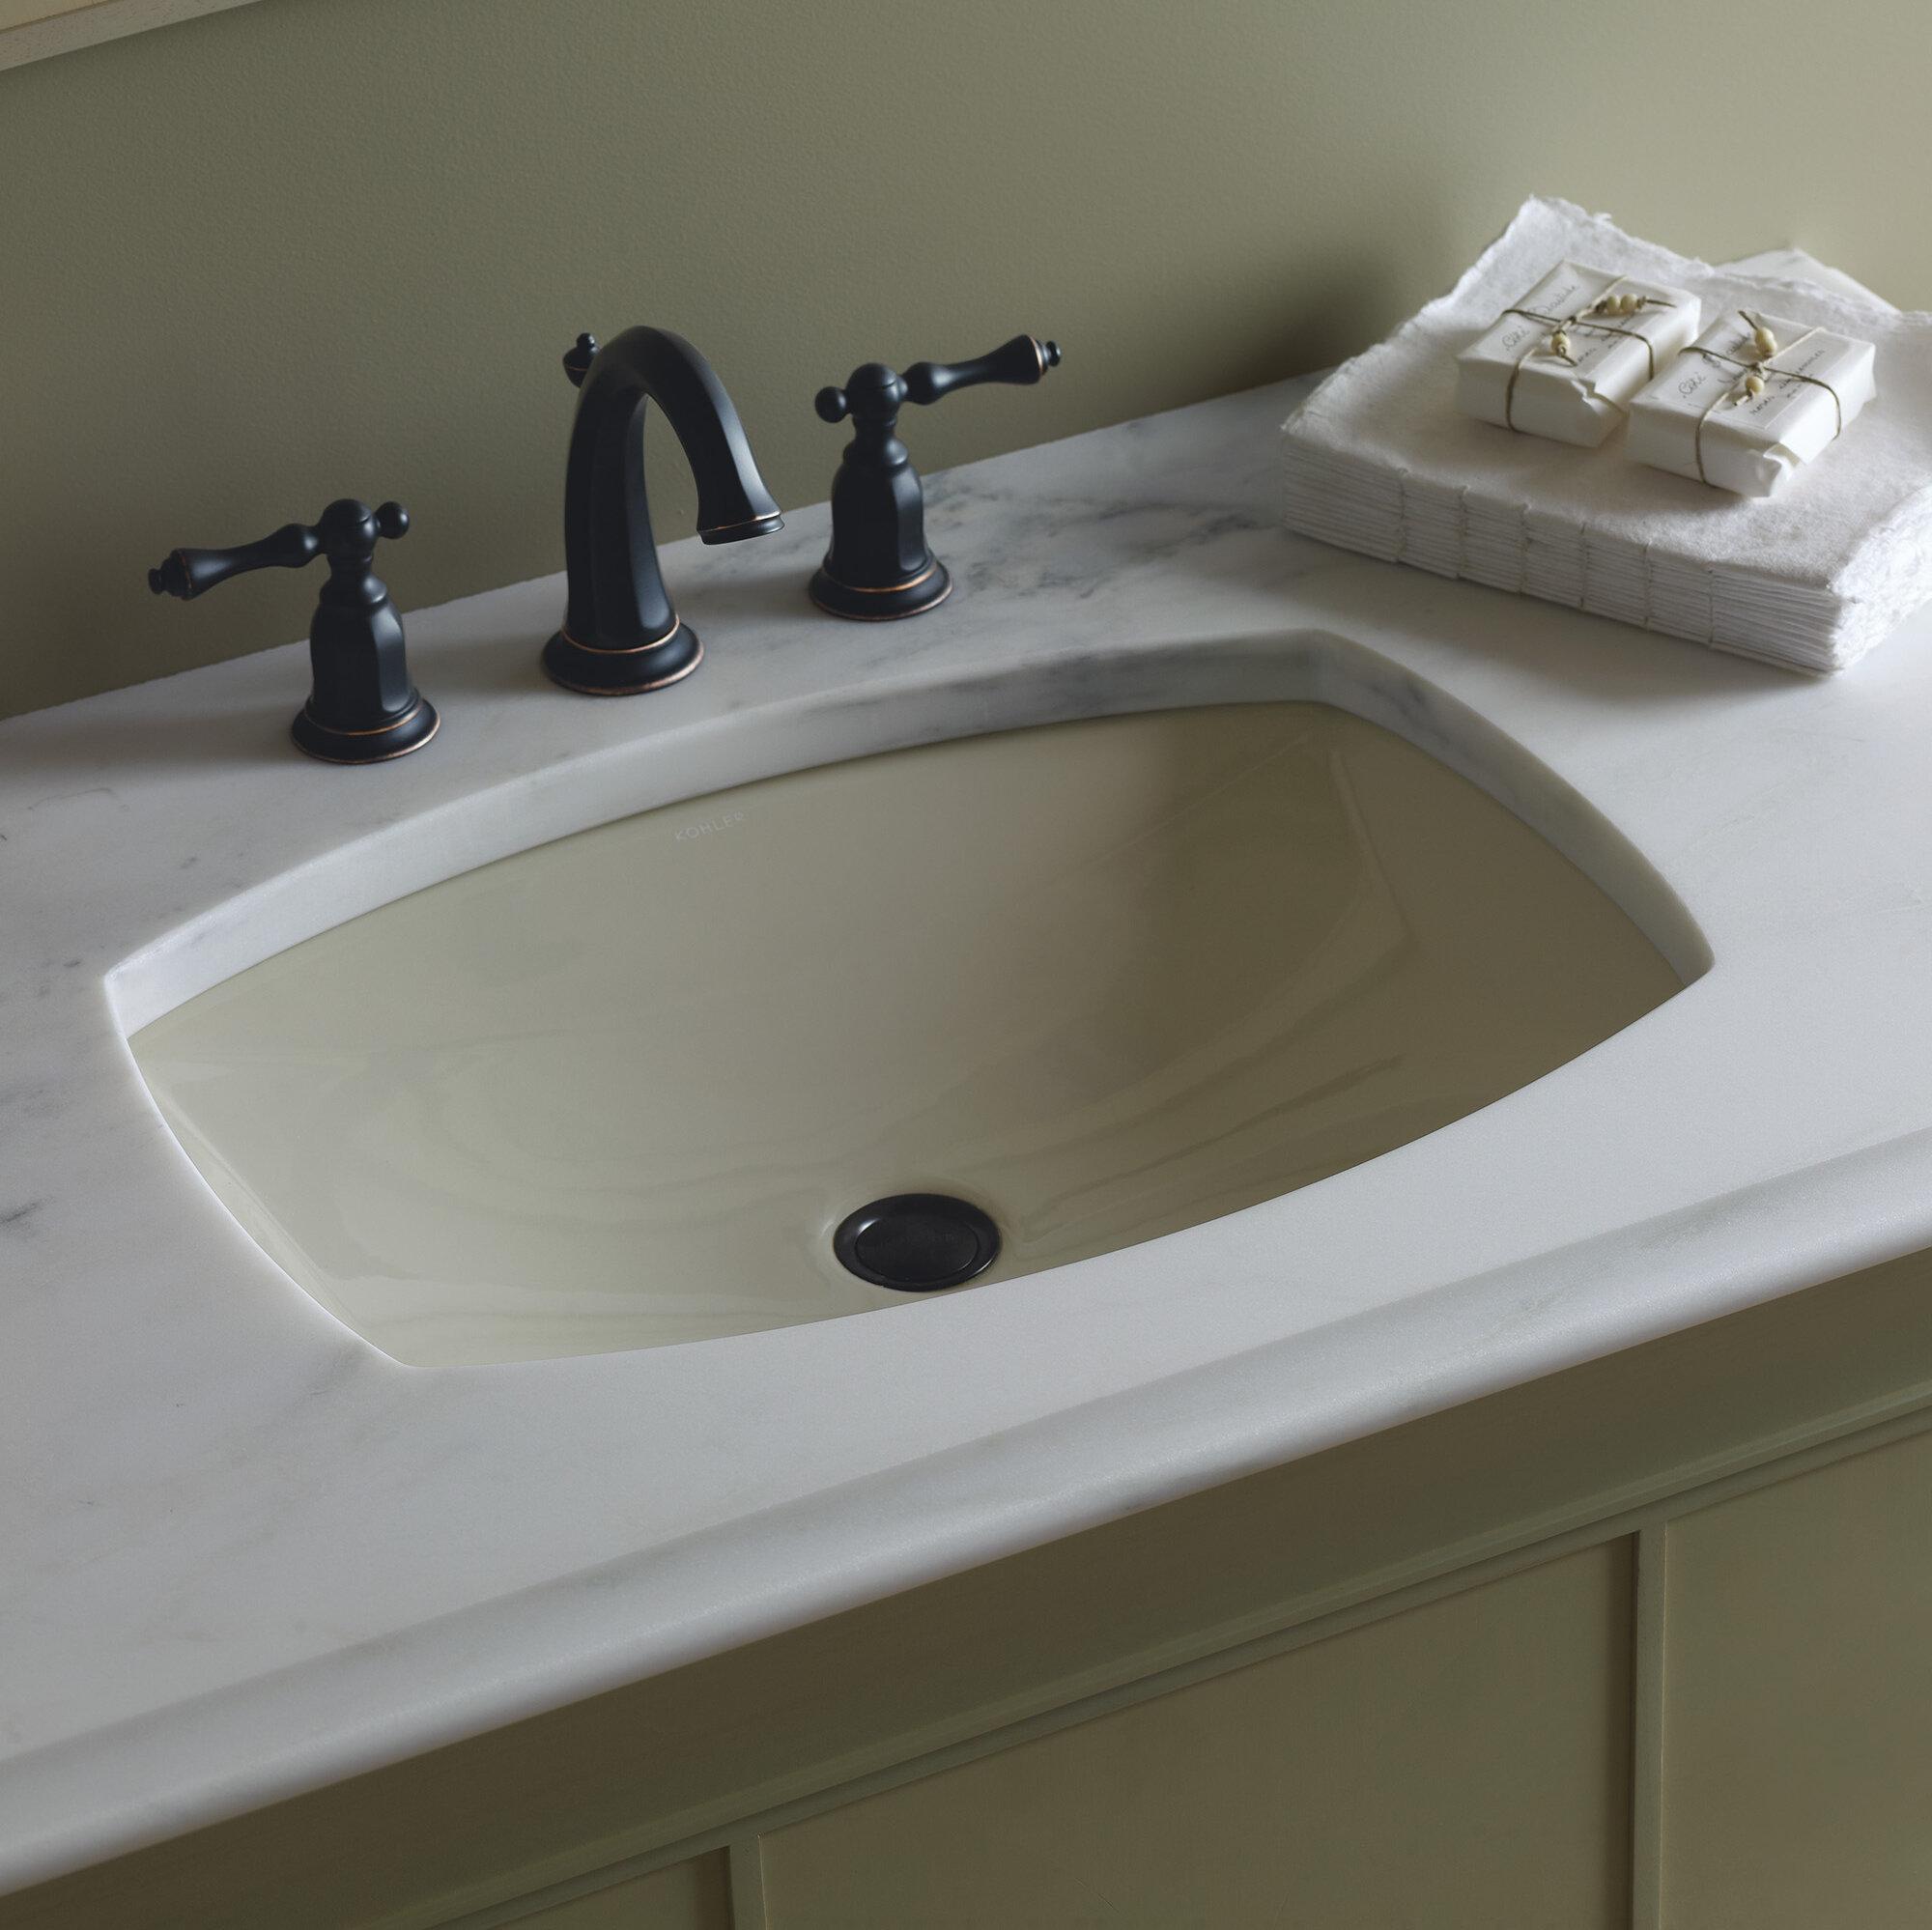 K 2382 0 95 96 Kohler Kelston Ceramic Rectangular Undermount Bathroom Sink With Overflow Reviews Wayfair